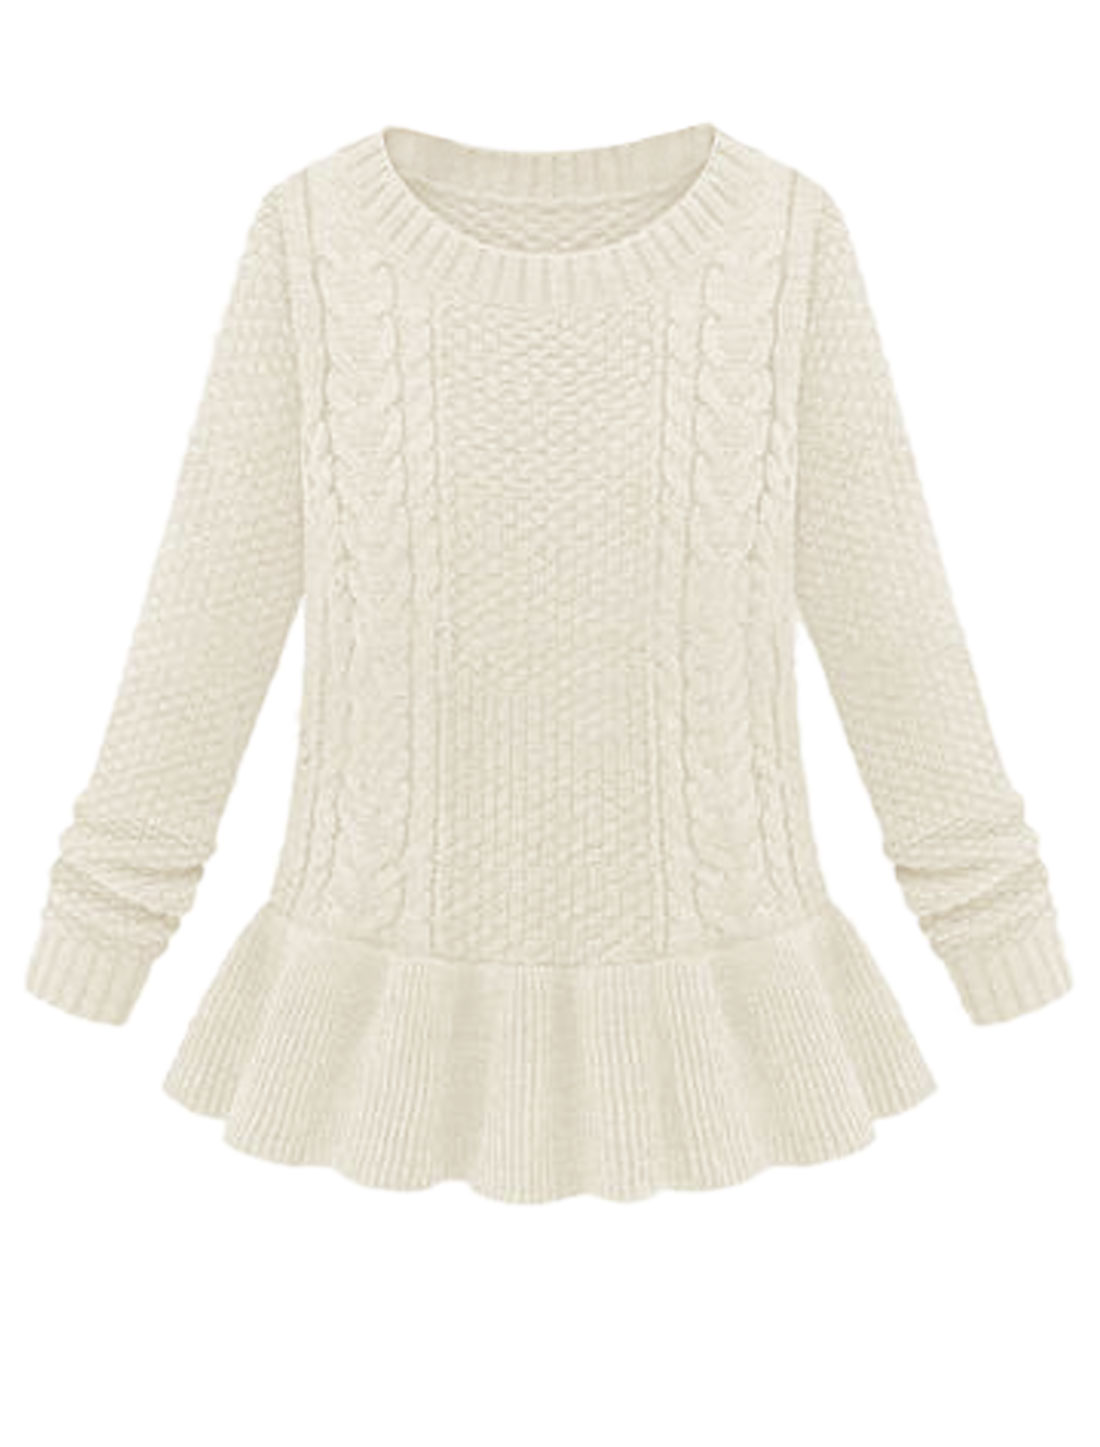 Lady Round Neck Ribbed Cuff w Hem Casual Peplum Sweater Beige M